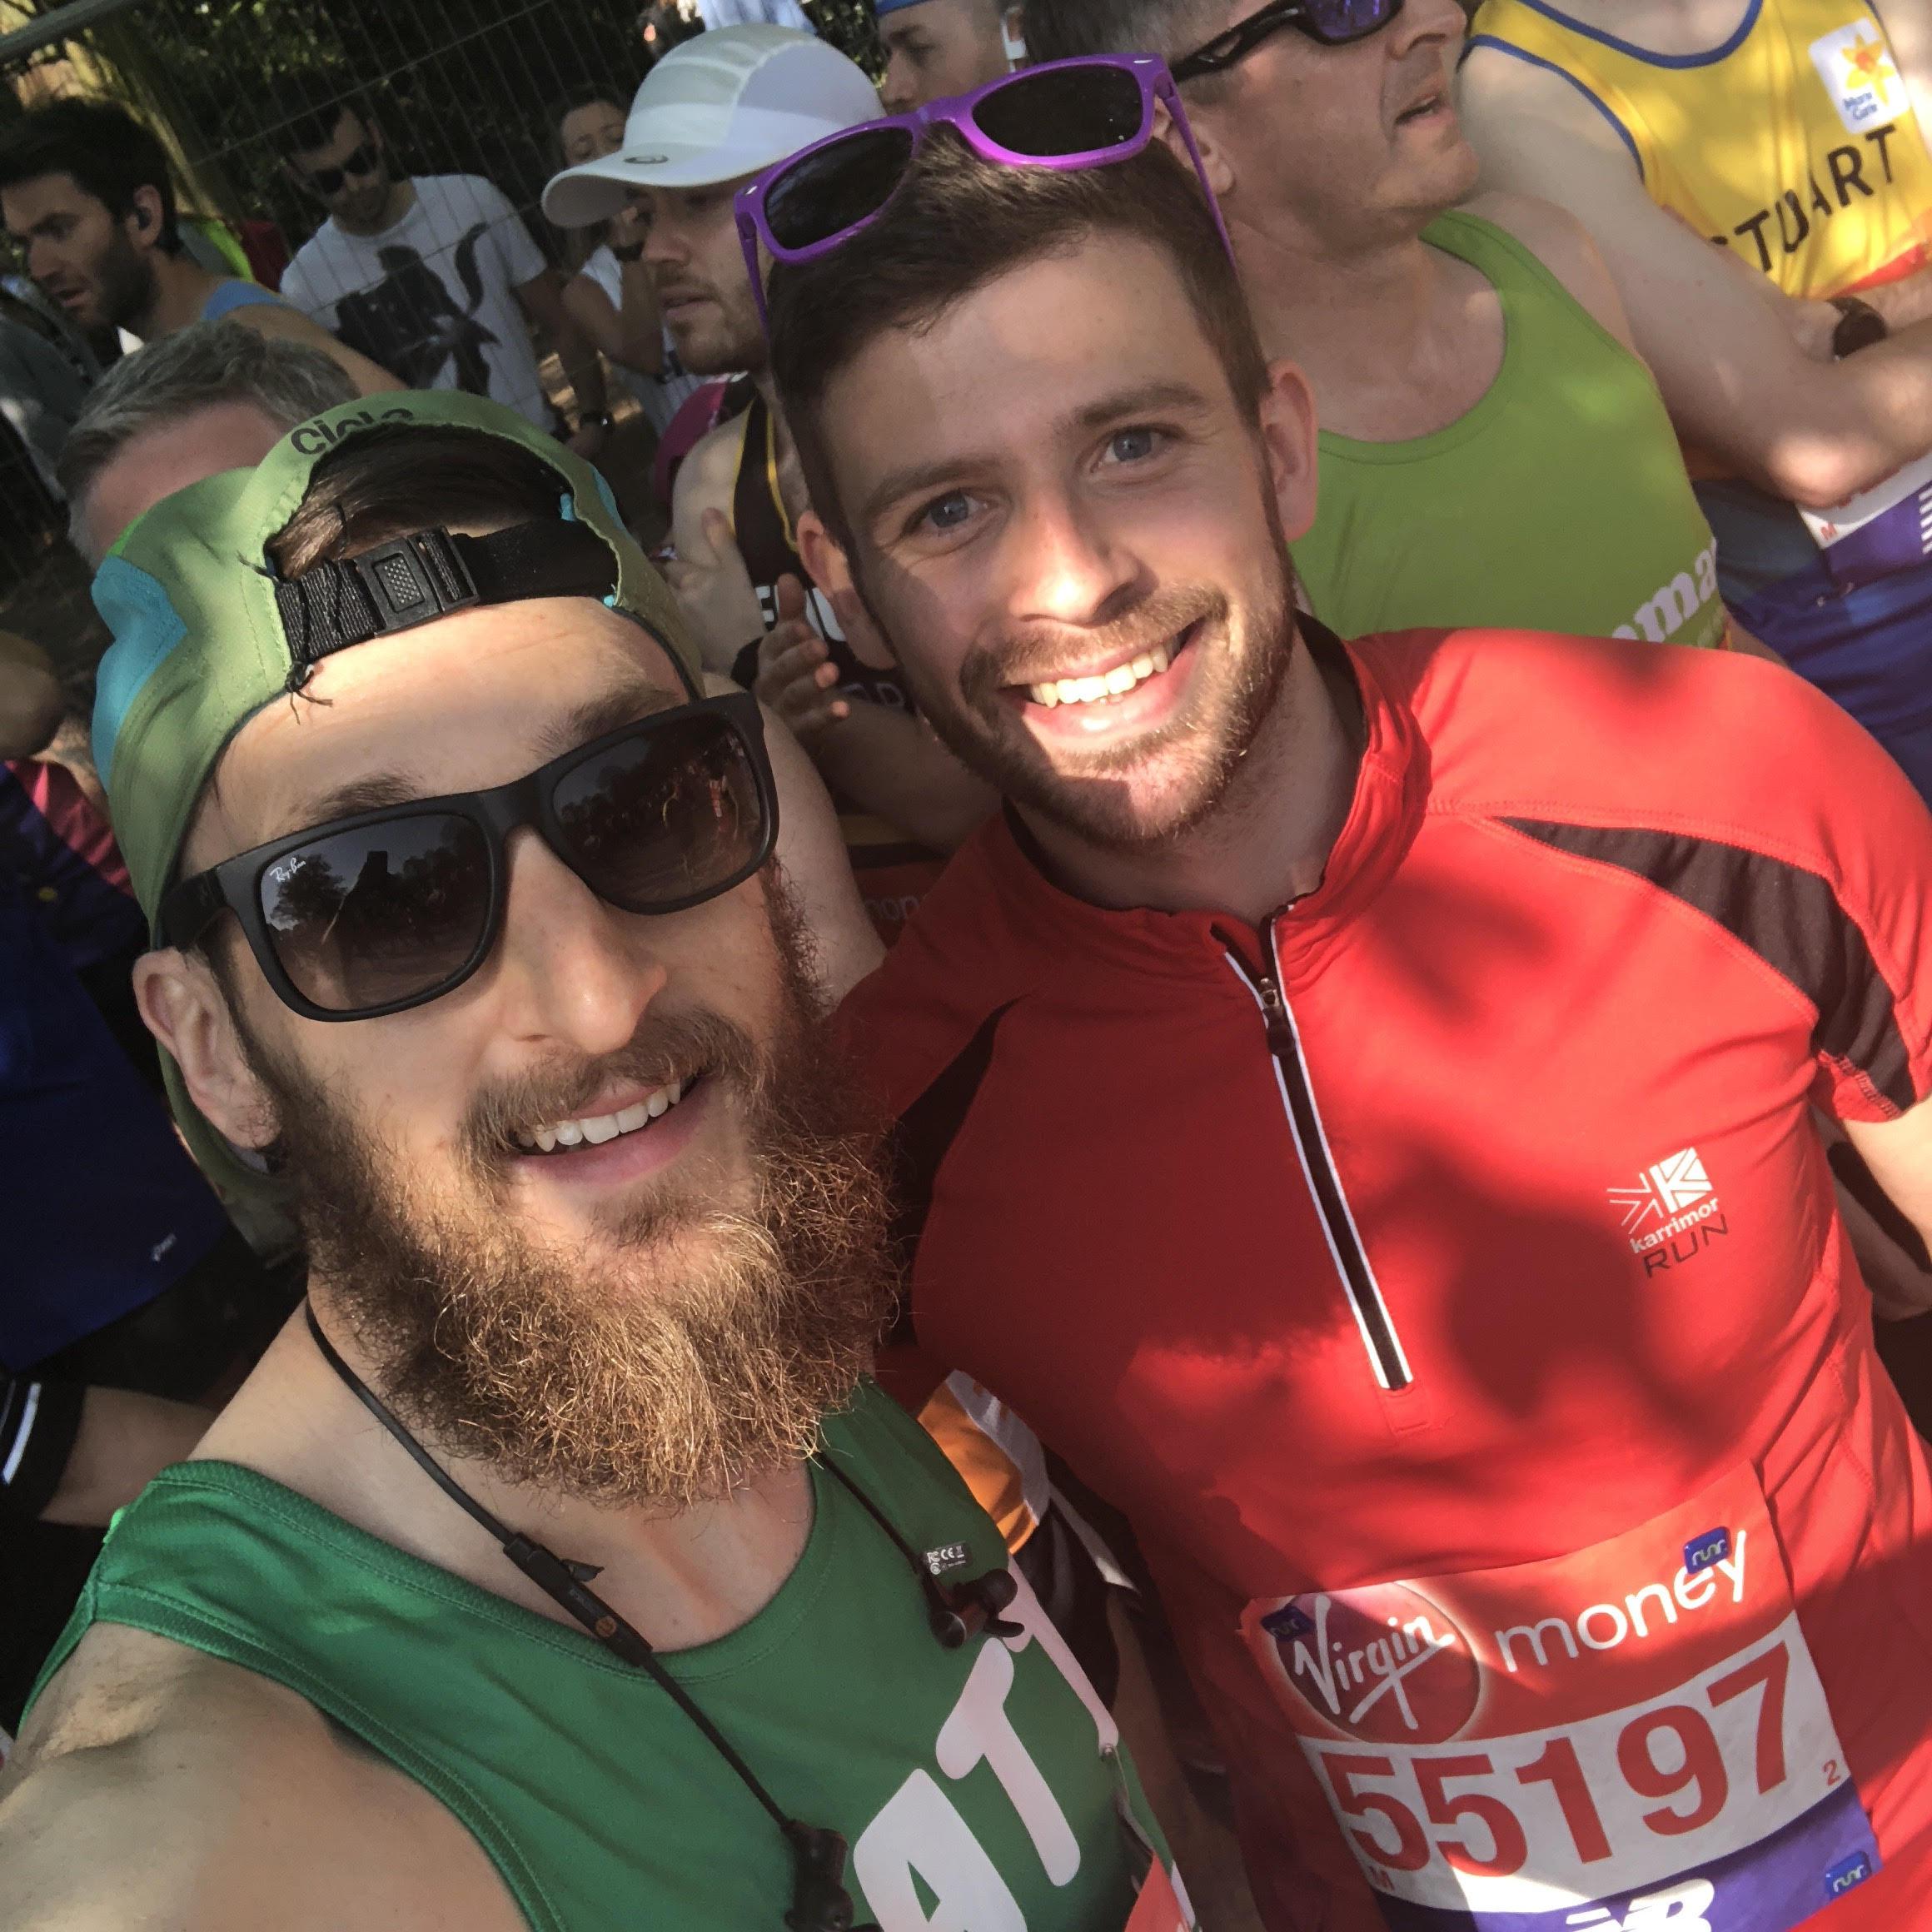 Two Matts One Marathon